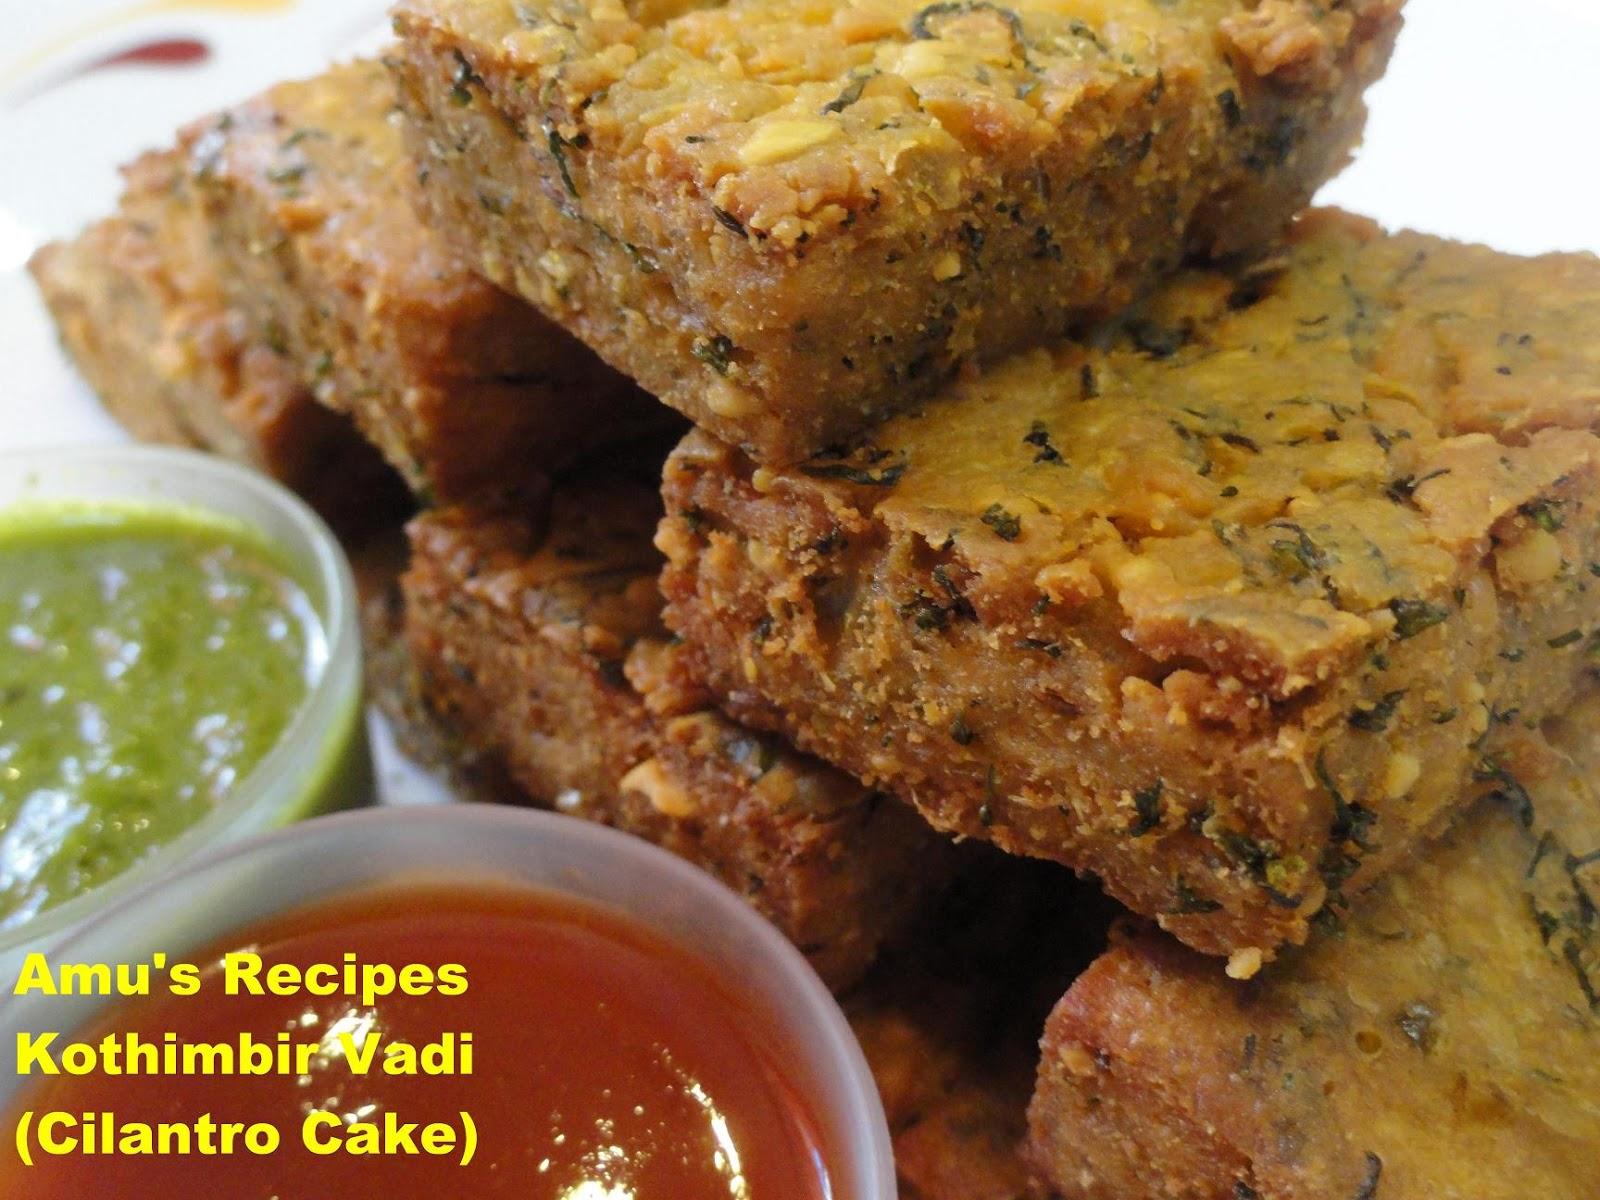 Various Cake Recipes In Marathi: AMU'S RECIPES: Kothimbir Vadi (Cilantro Cakes